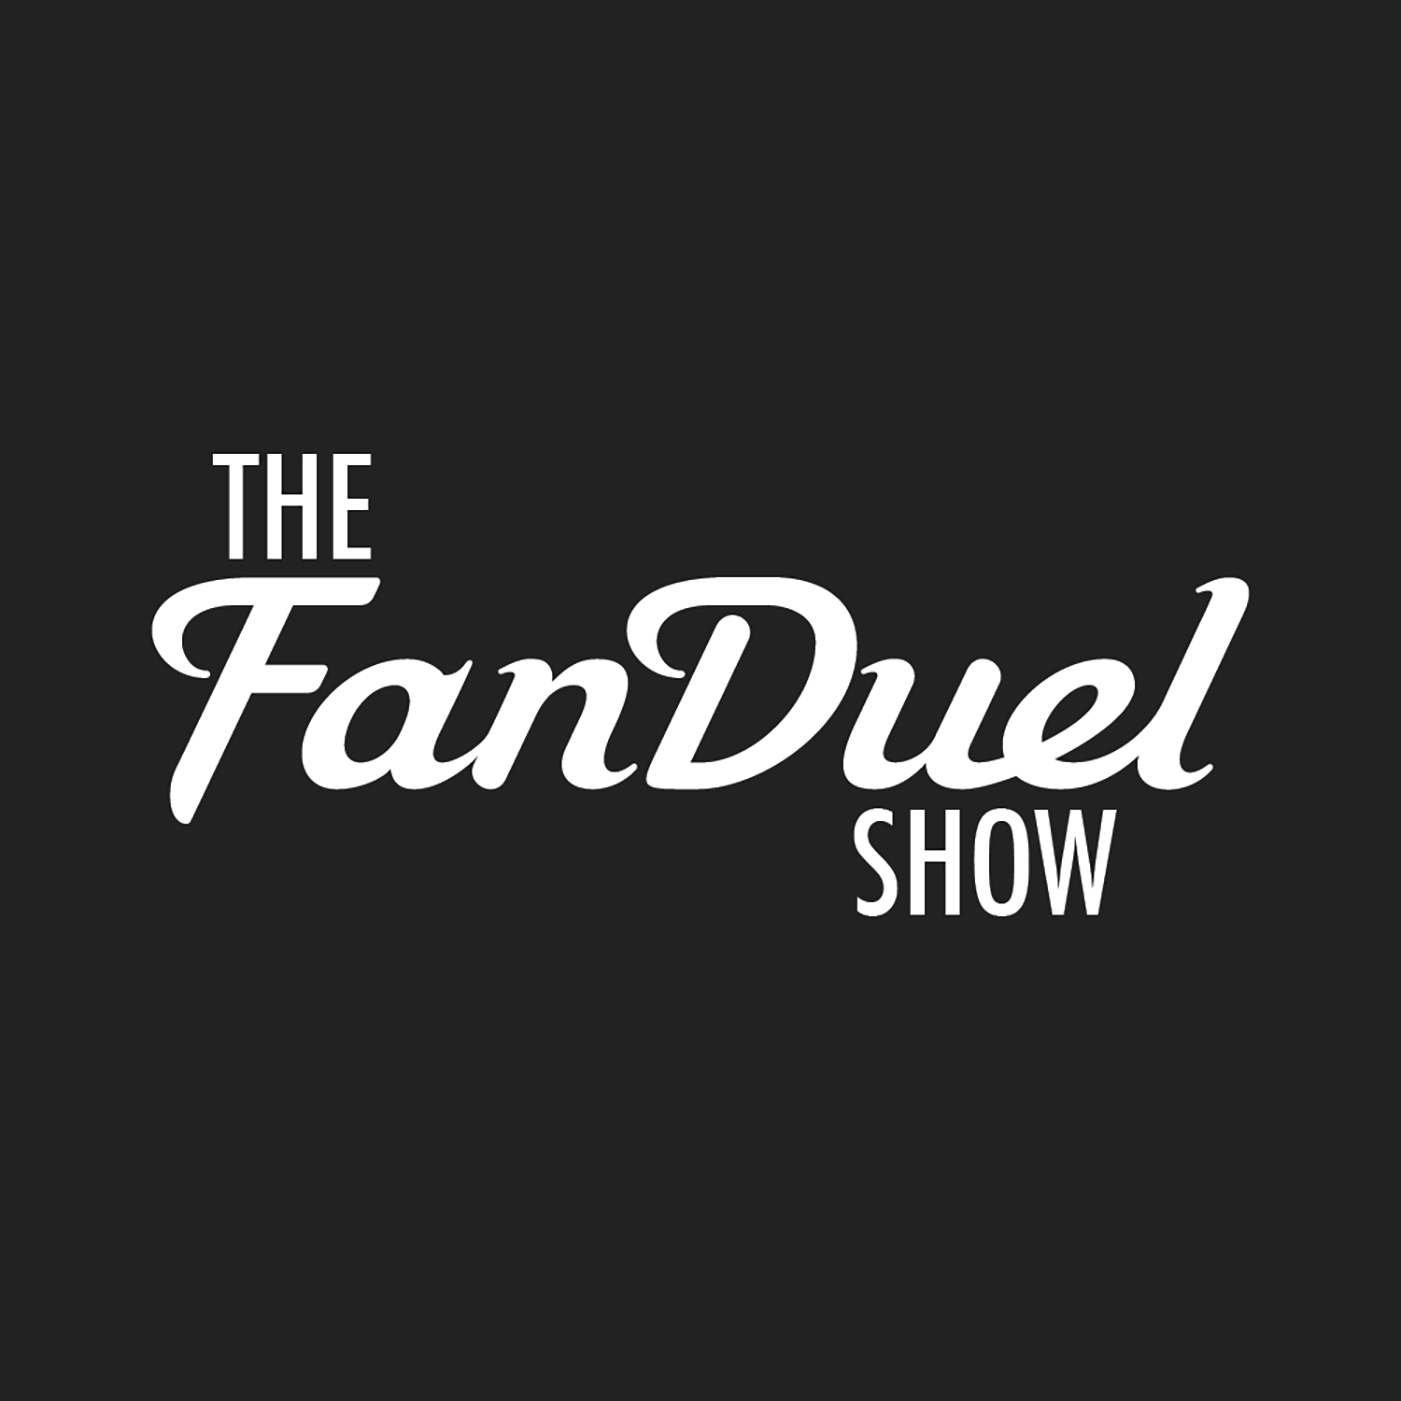 The FanDuel Show